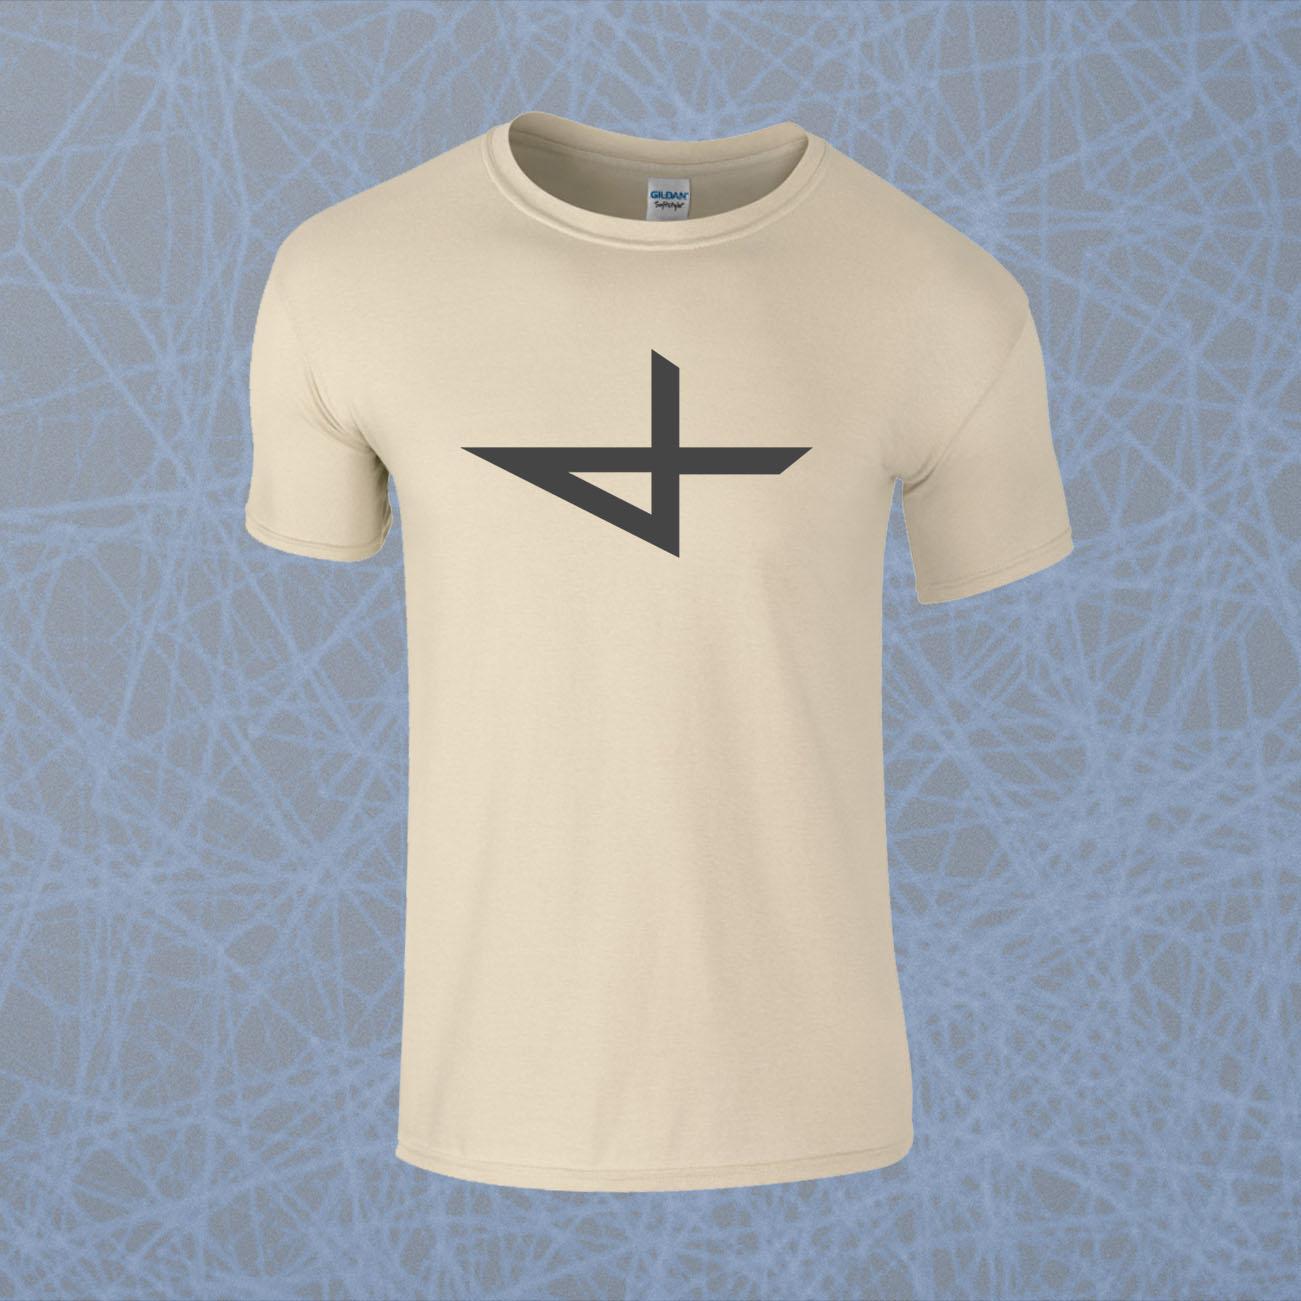 Devin Townsend - 'Symbol' T-Shirt - Devin Townsend